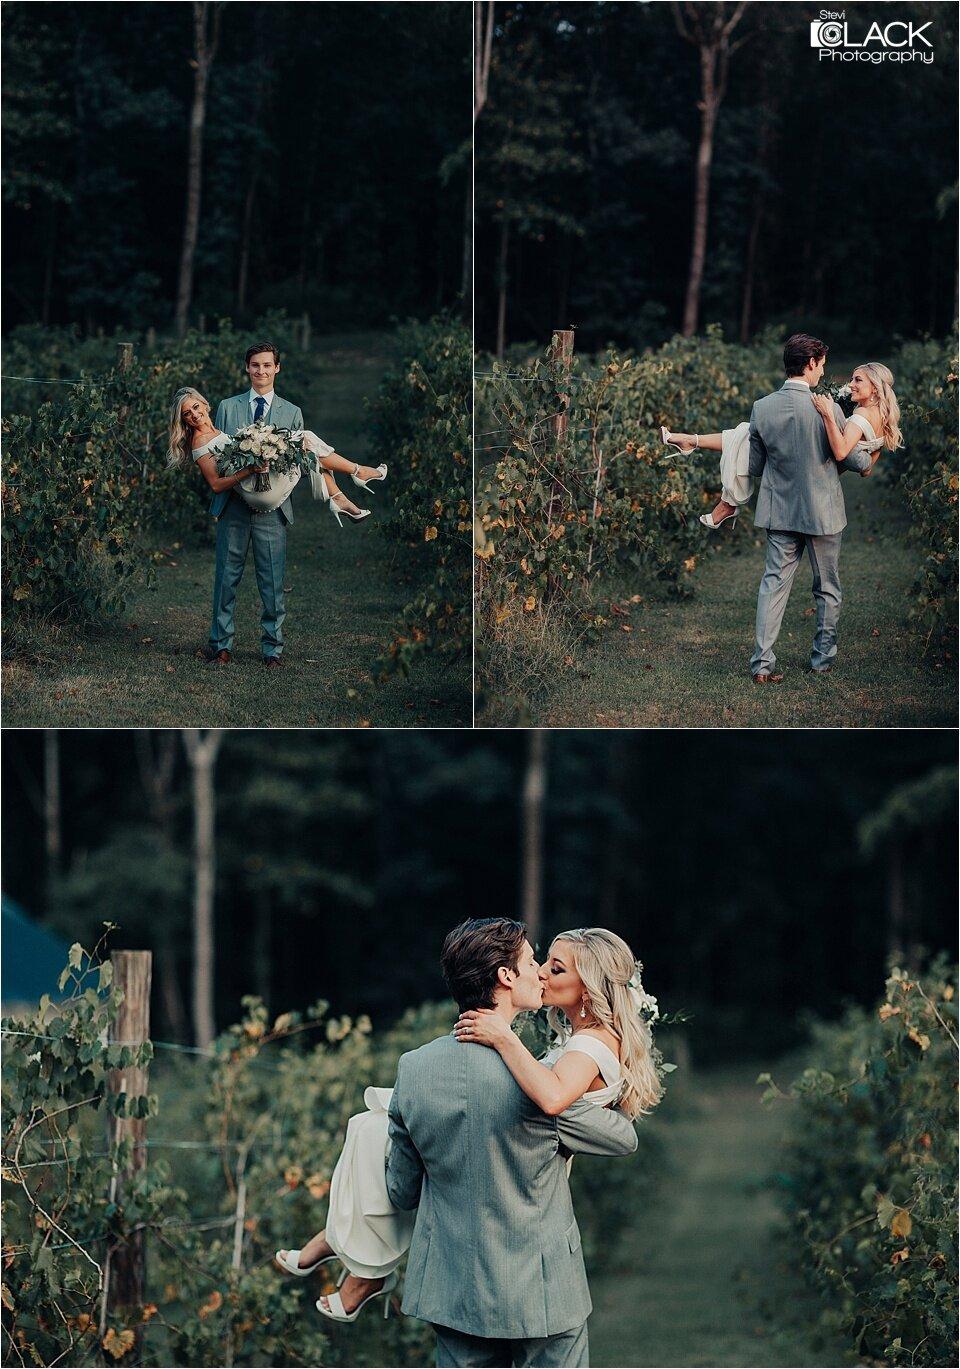 Atlanta wedding Photographer Stevi clack Photography_2469.jpg